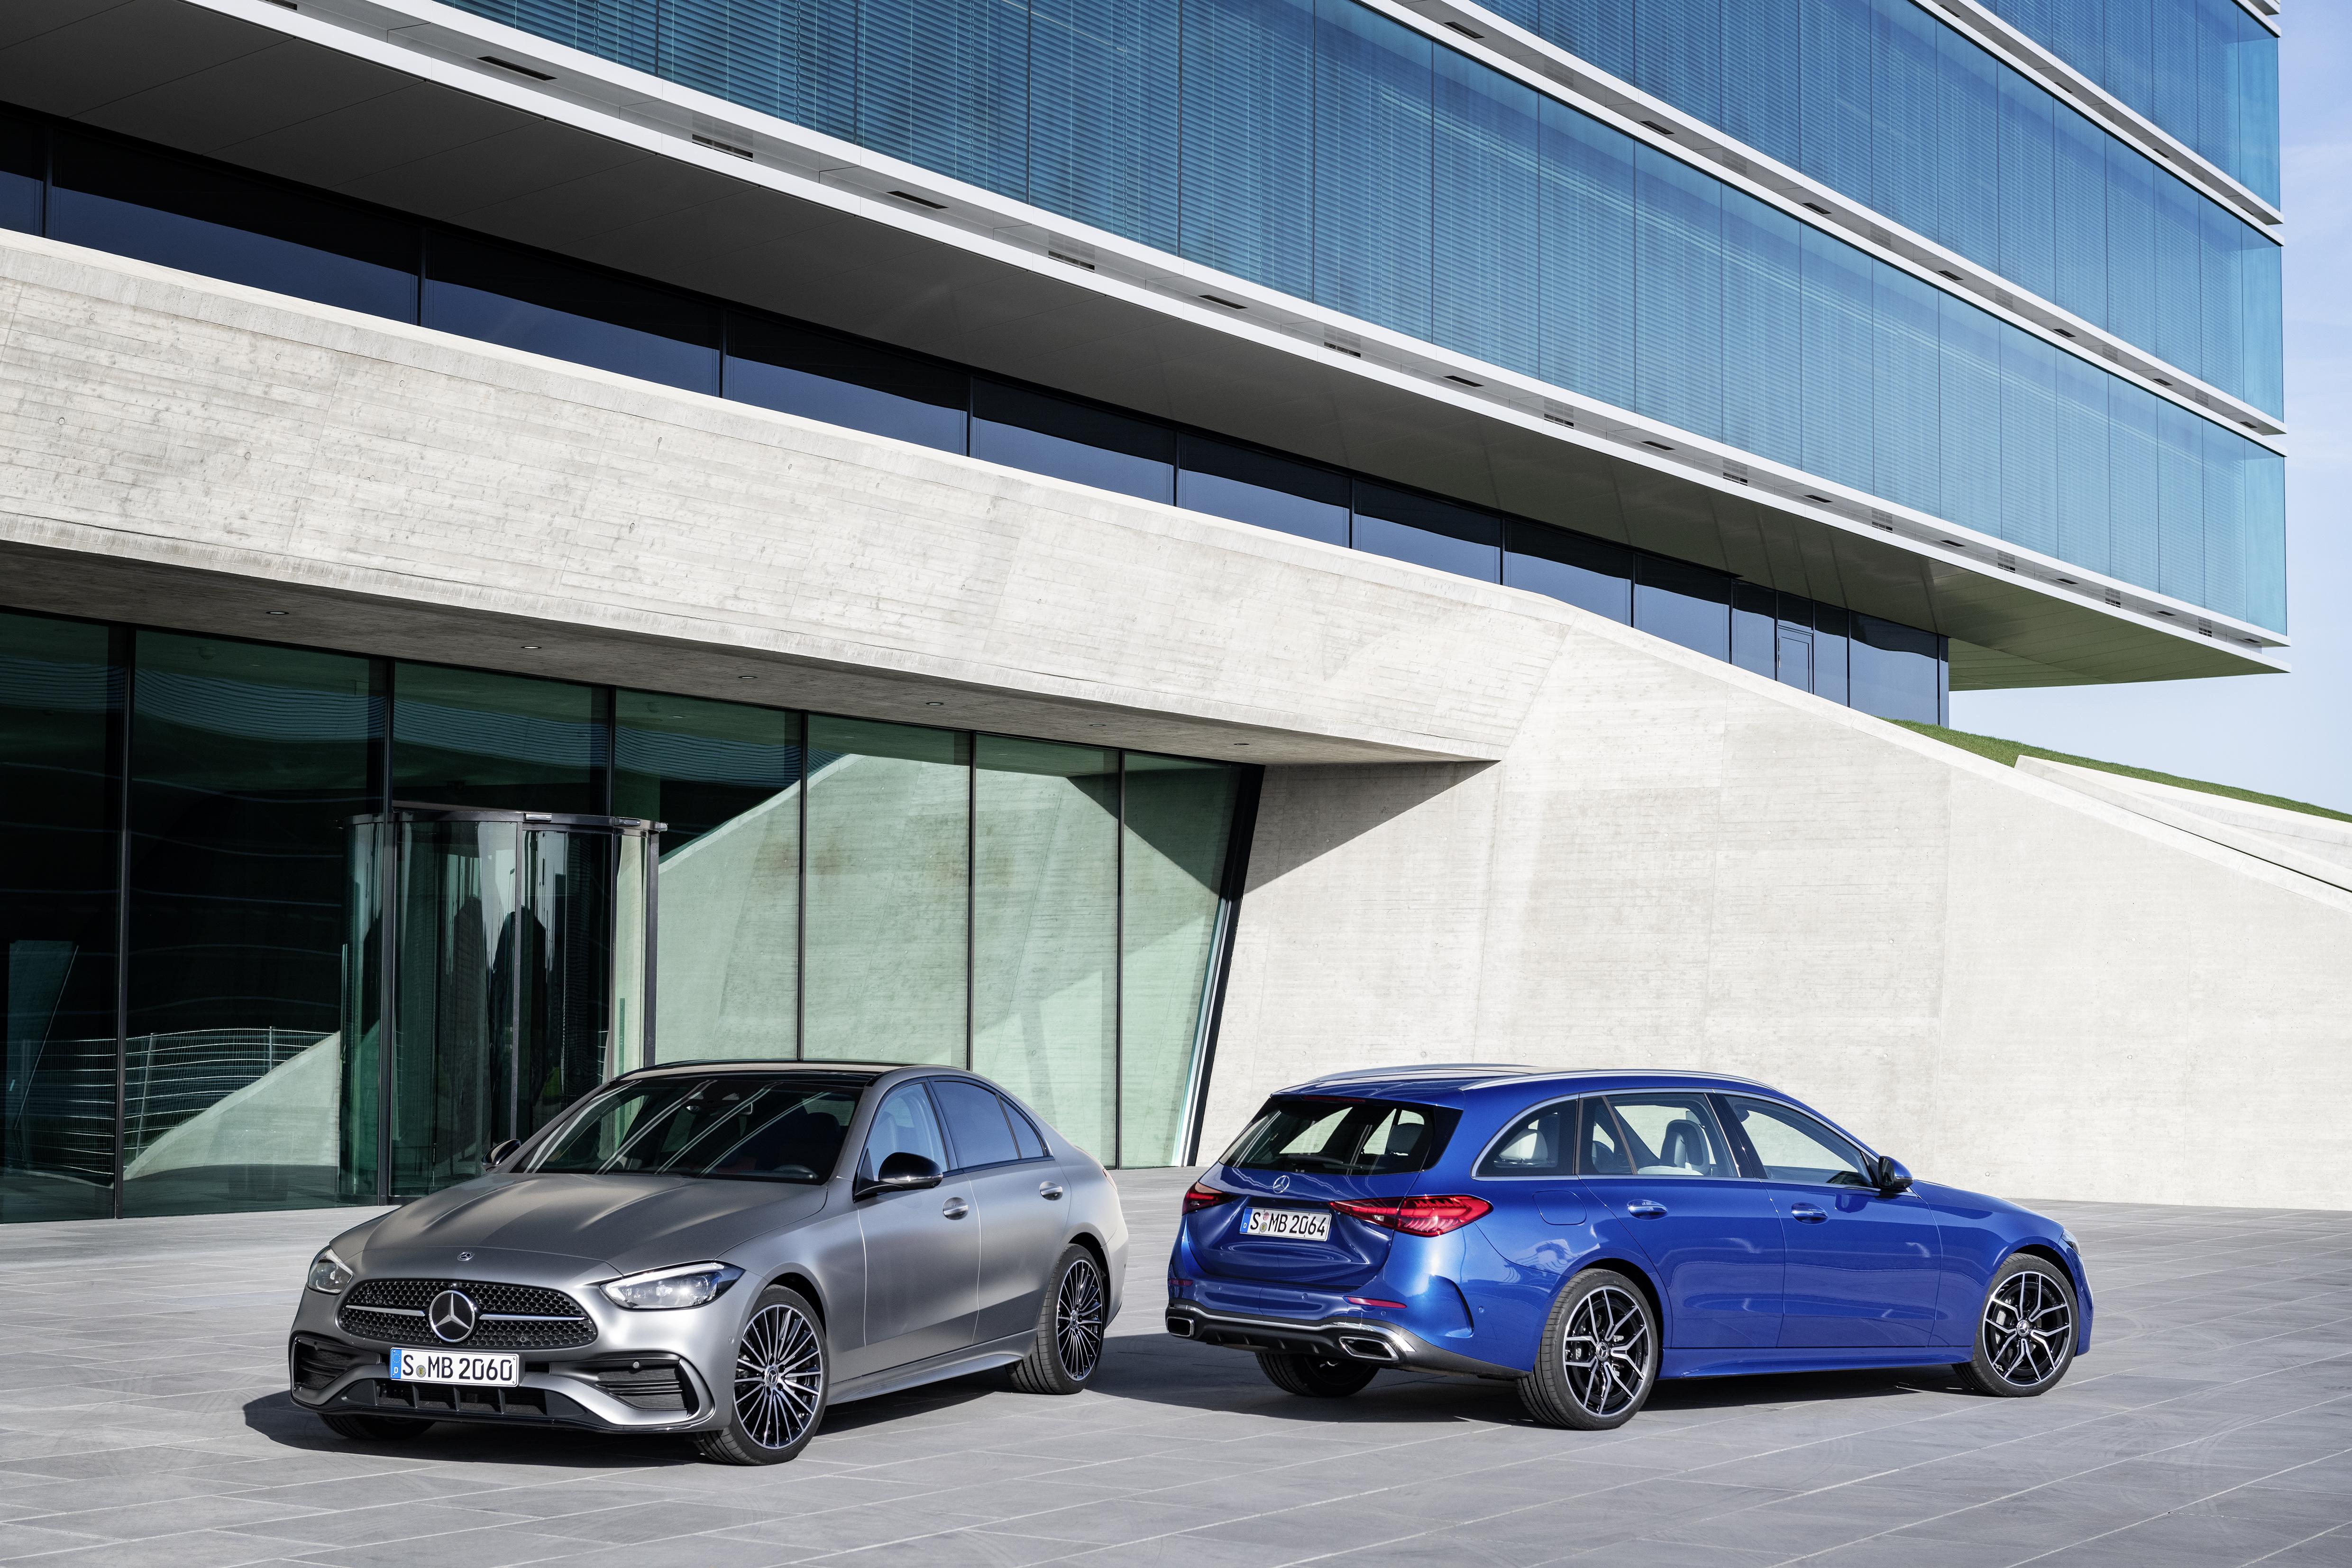 Helt ny Mercedes-Benz C-Klass visad - alltid elektrifierad